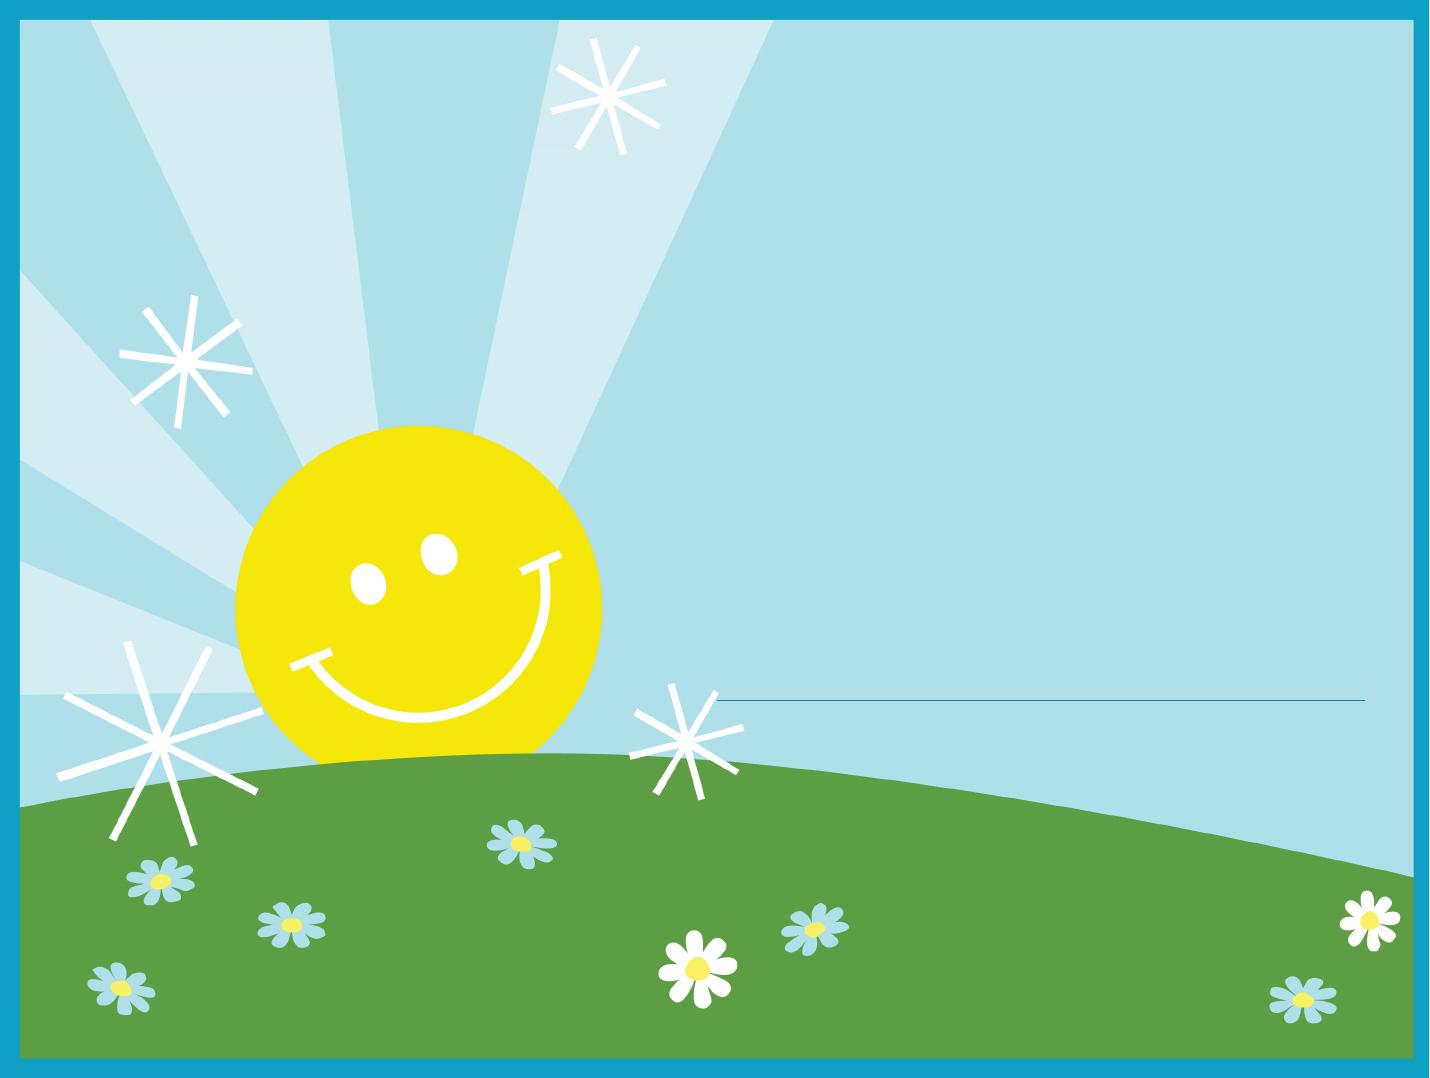 Download Preschool Diploma Certificate Sunshine Design For Free